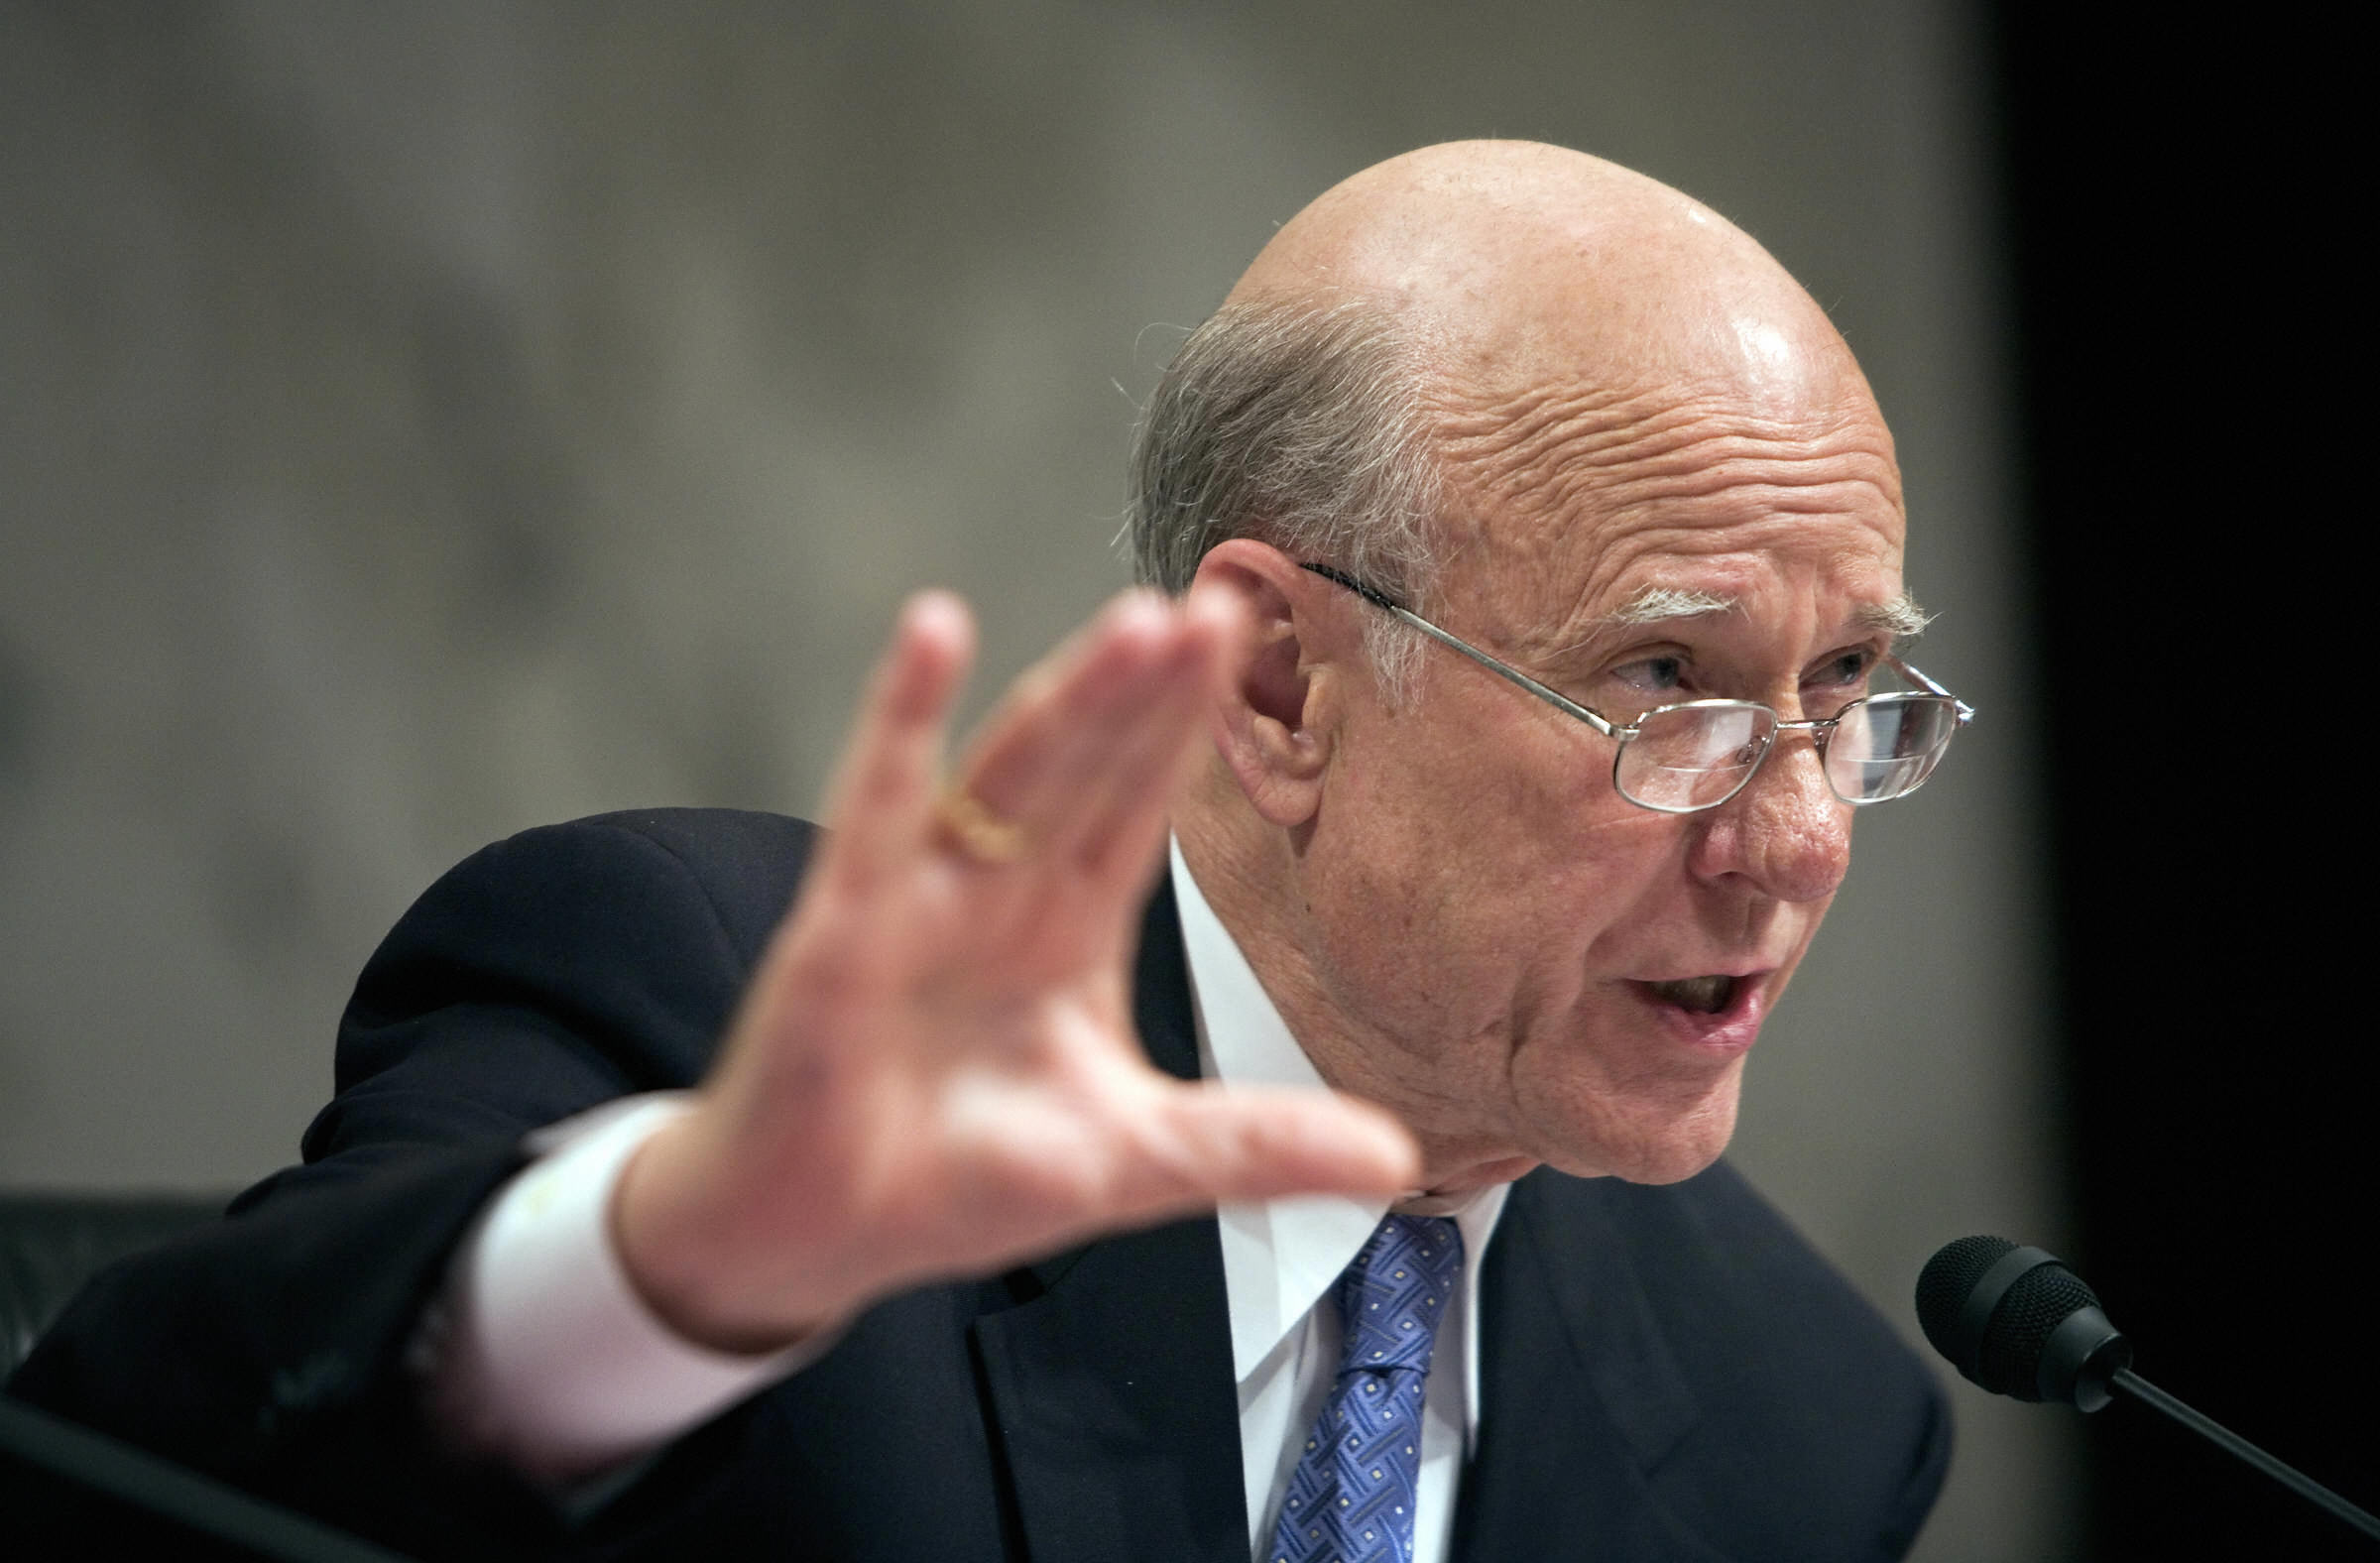 Senate Intelligence Committee Chairman